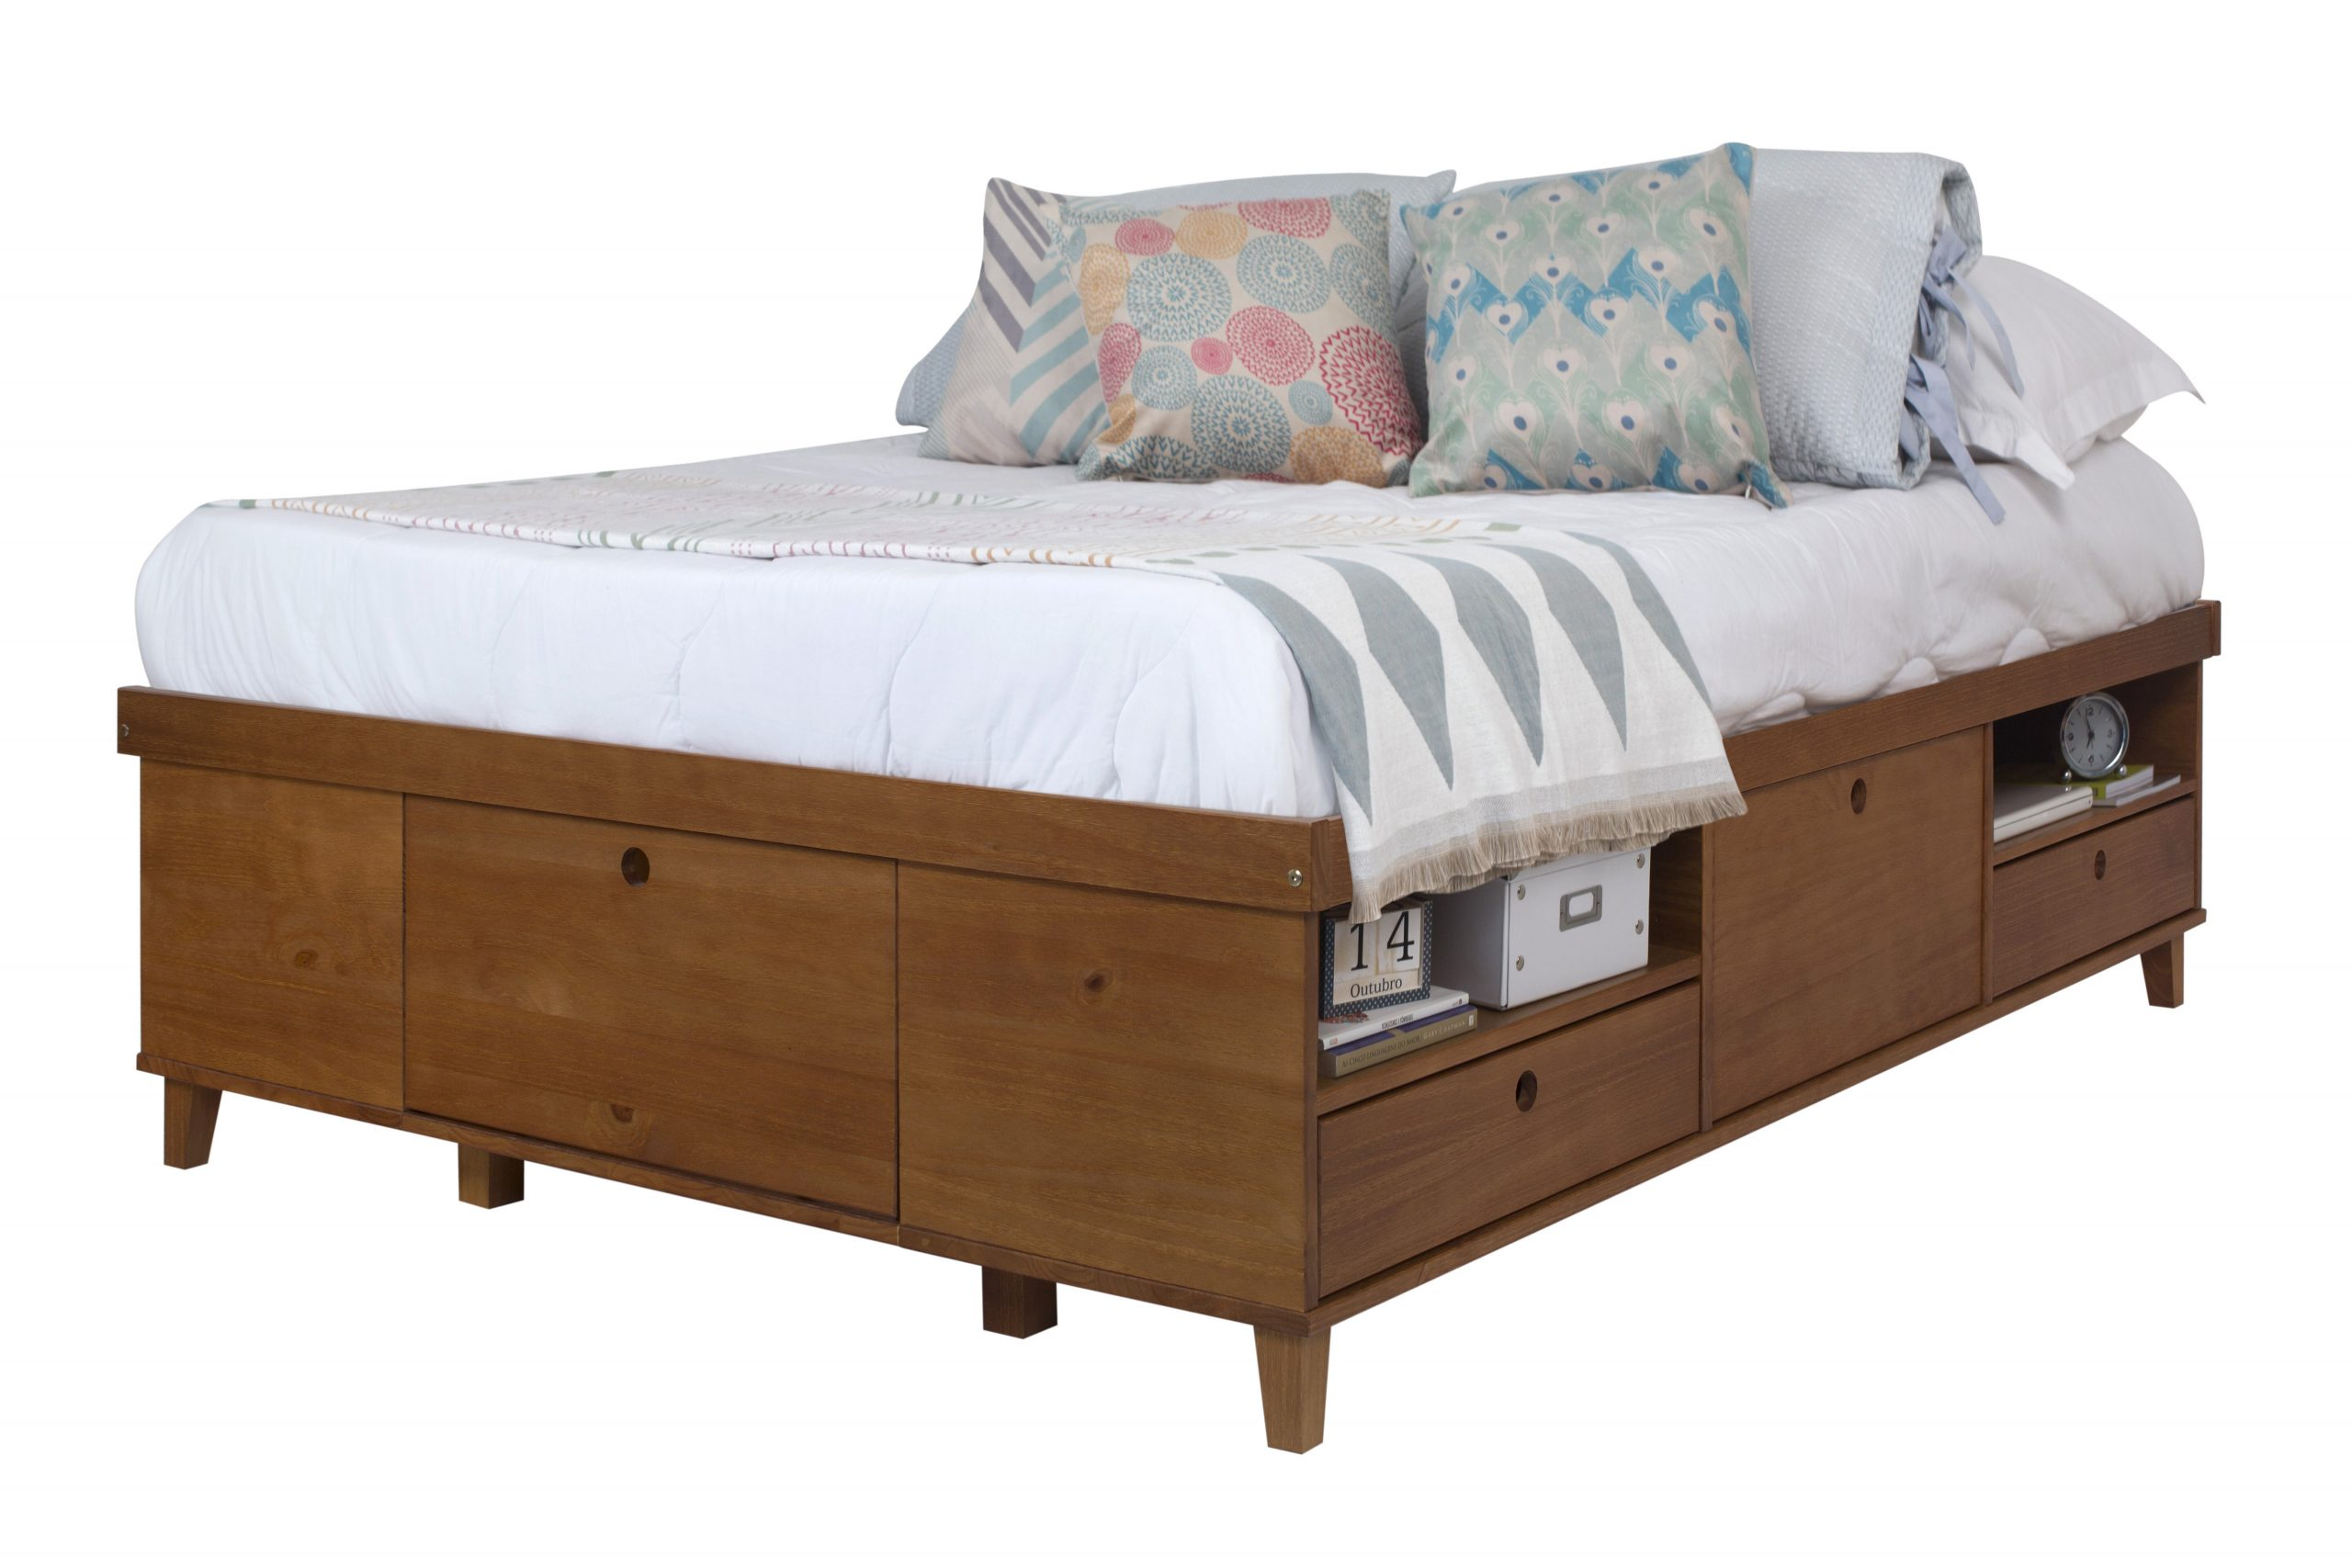 Full Size of Betten Aus Holz Oschmann Modernes Bett Ikea 160x200 180x200 Rustikales 220 X 200 Ebay Niedrig Weiß 100x200 Xxl Flexa Schwarz 120x200 Mit Matratze Und Bett Stauraum Bett 160x200